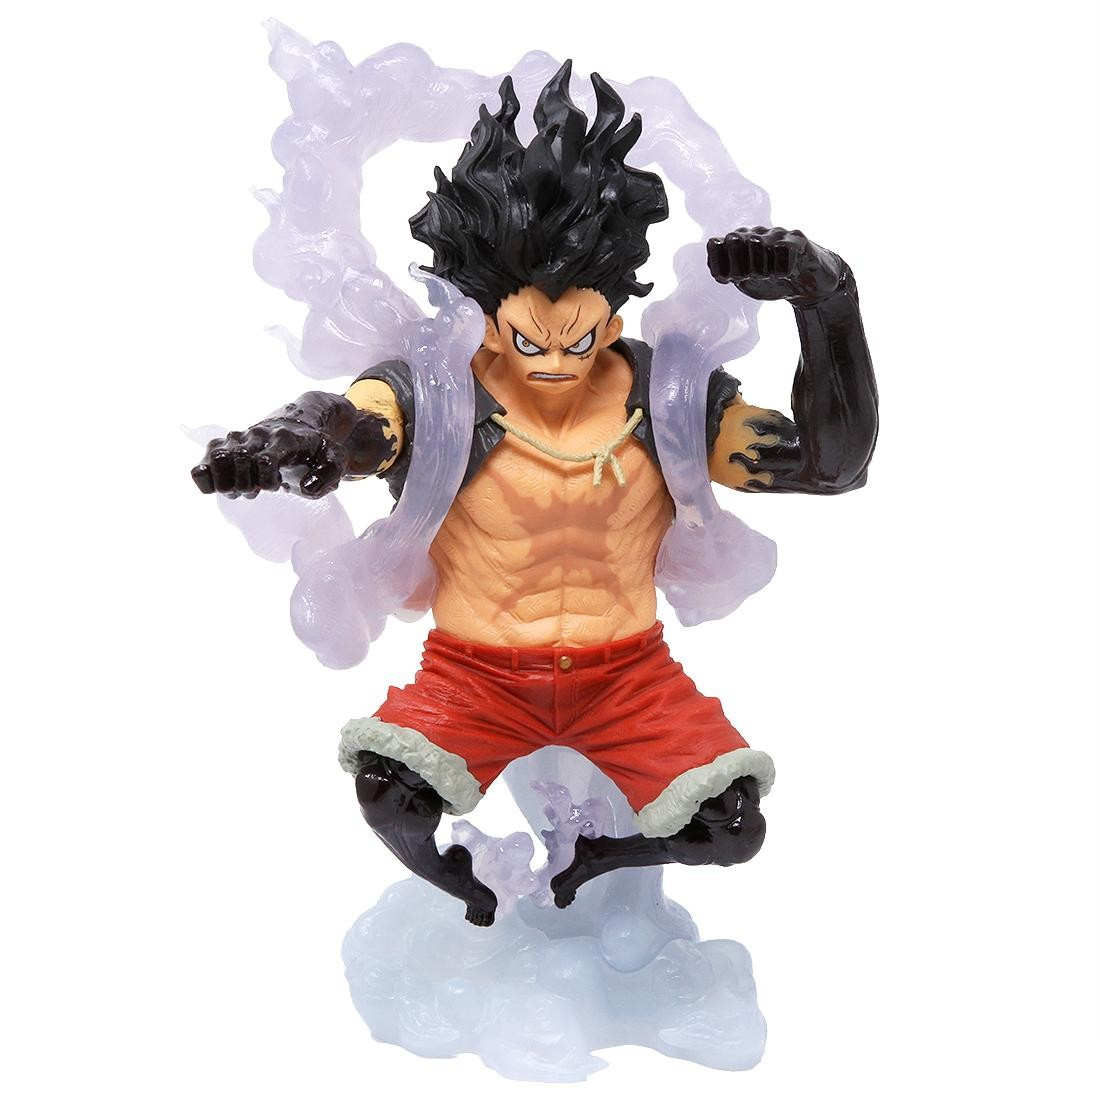 ONE PIECE Monkey D Luffy King of Artist The Snakeman Rufy Rubber Figure Anime